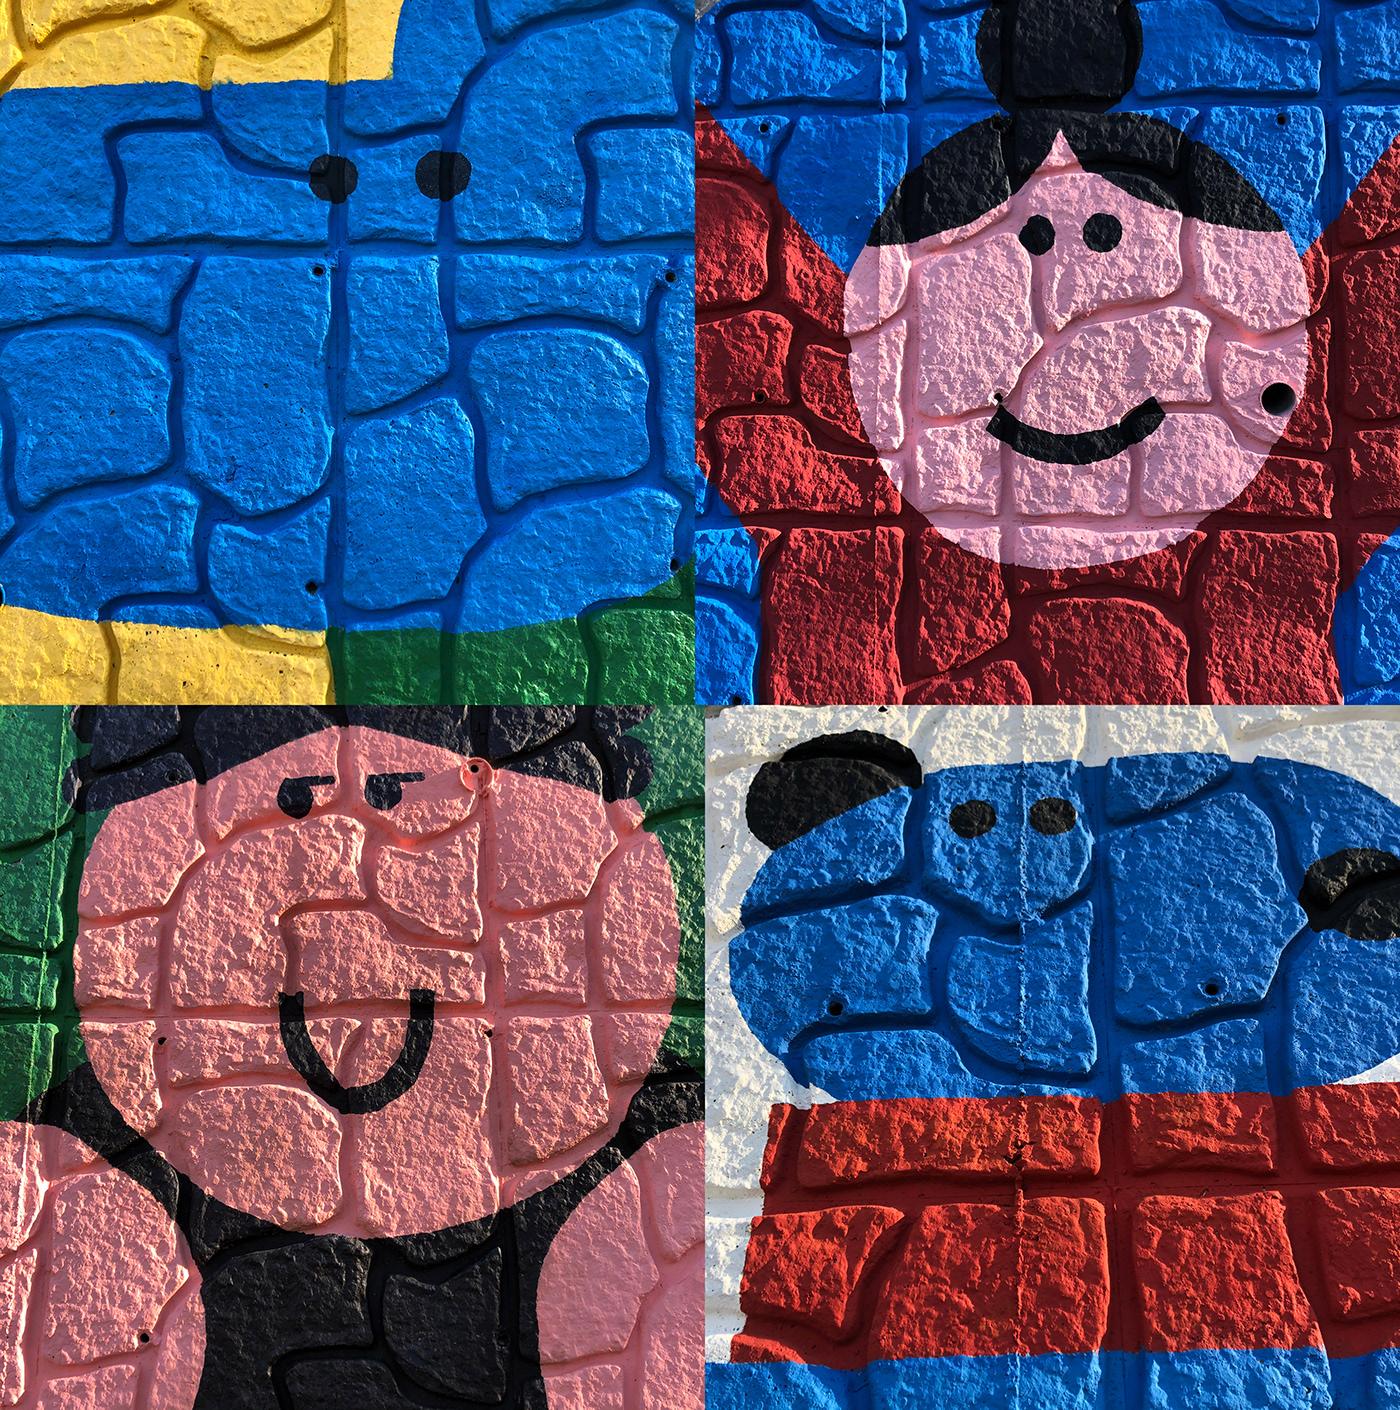 Thumbnail for Jungnang-gu Mural Project Turns a Neighborhood Into an Artistic Movement